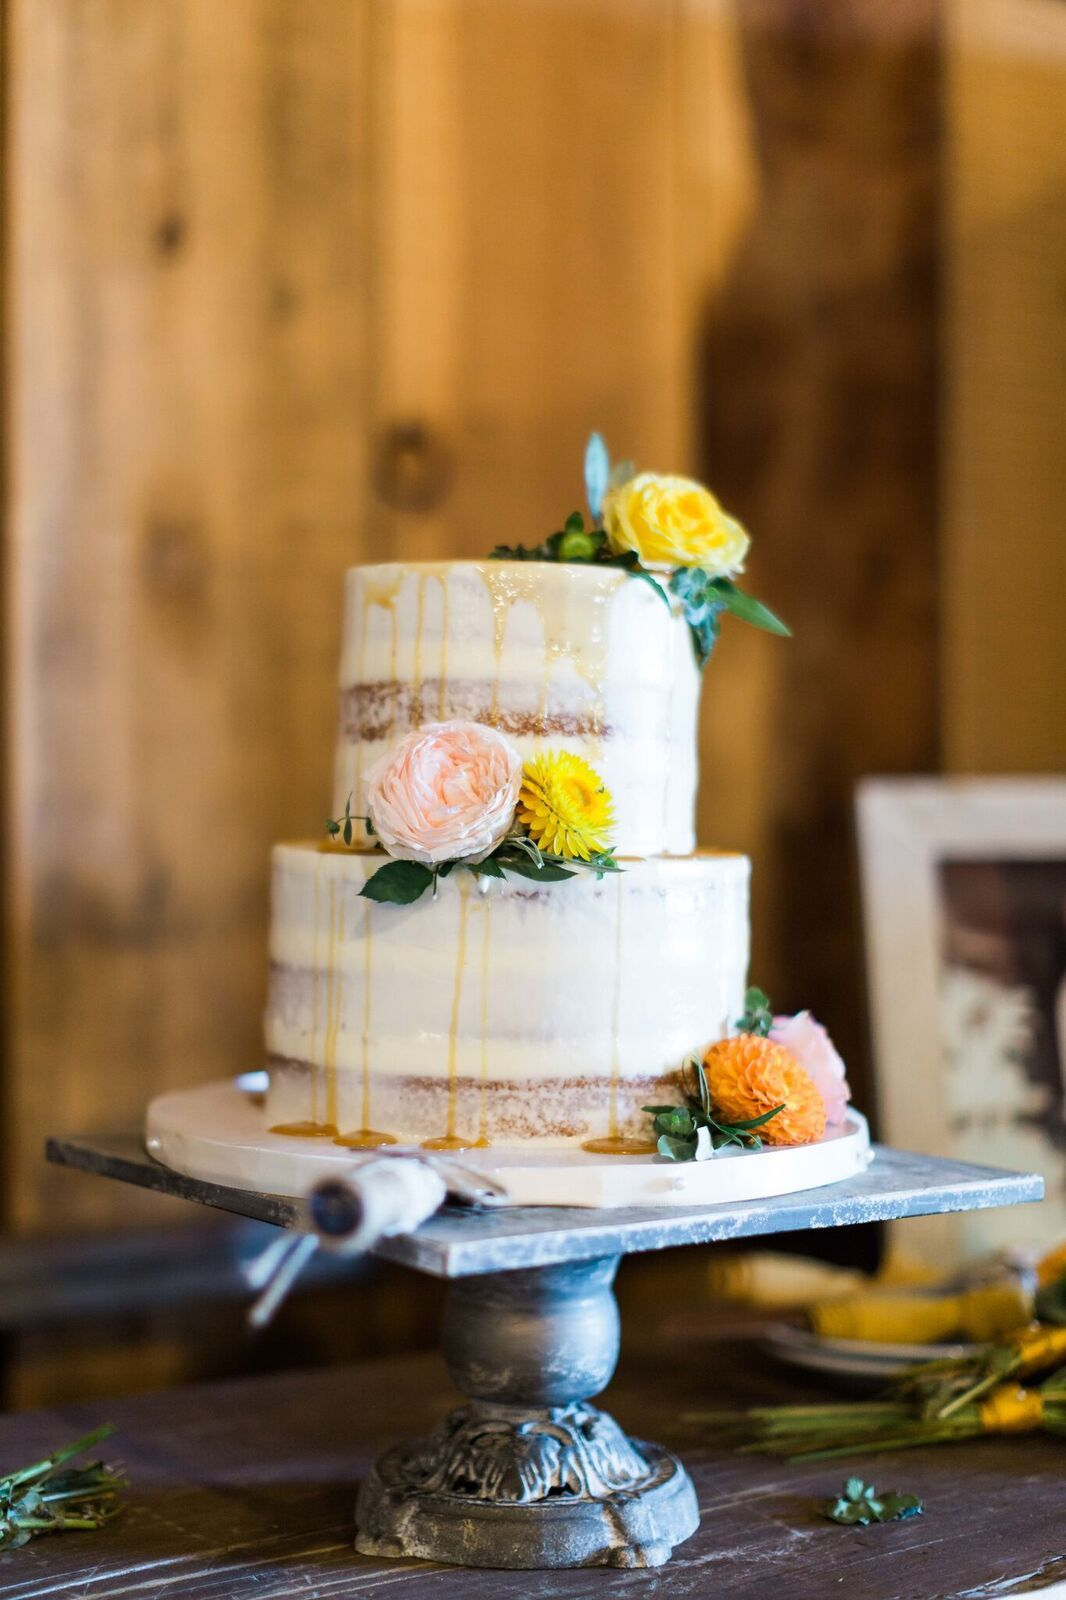 Seminaked two tier wedding cake with fresh flowers wedding design